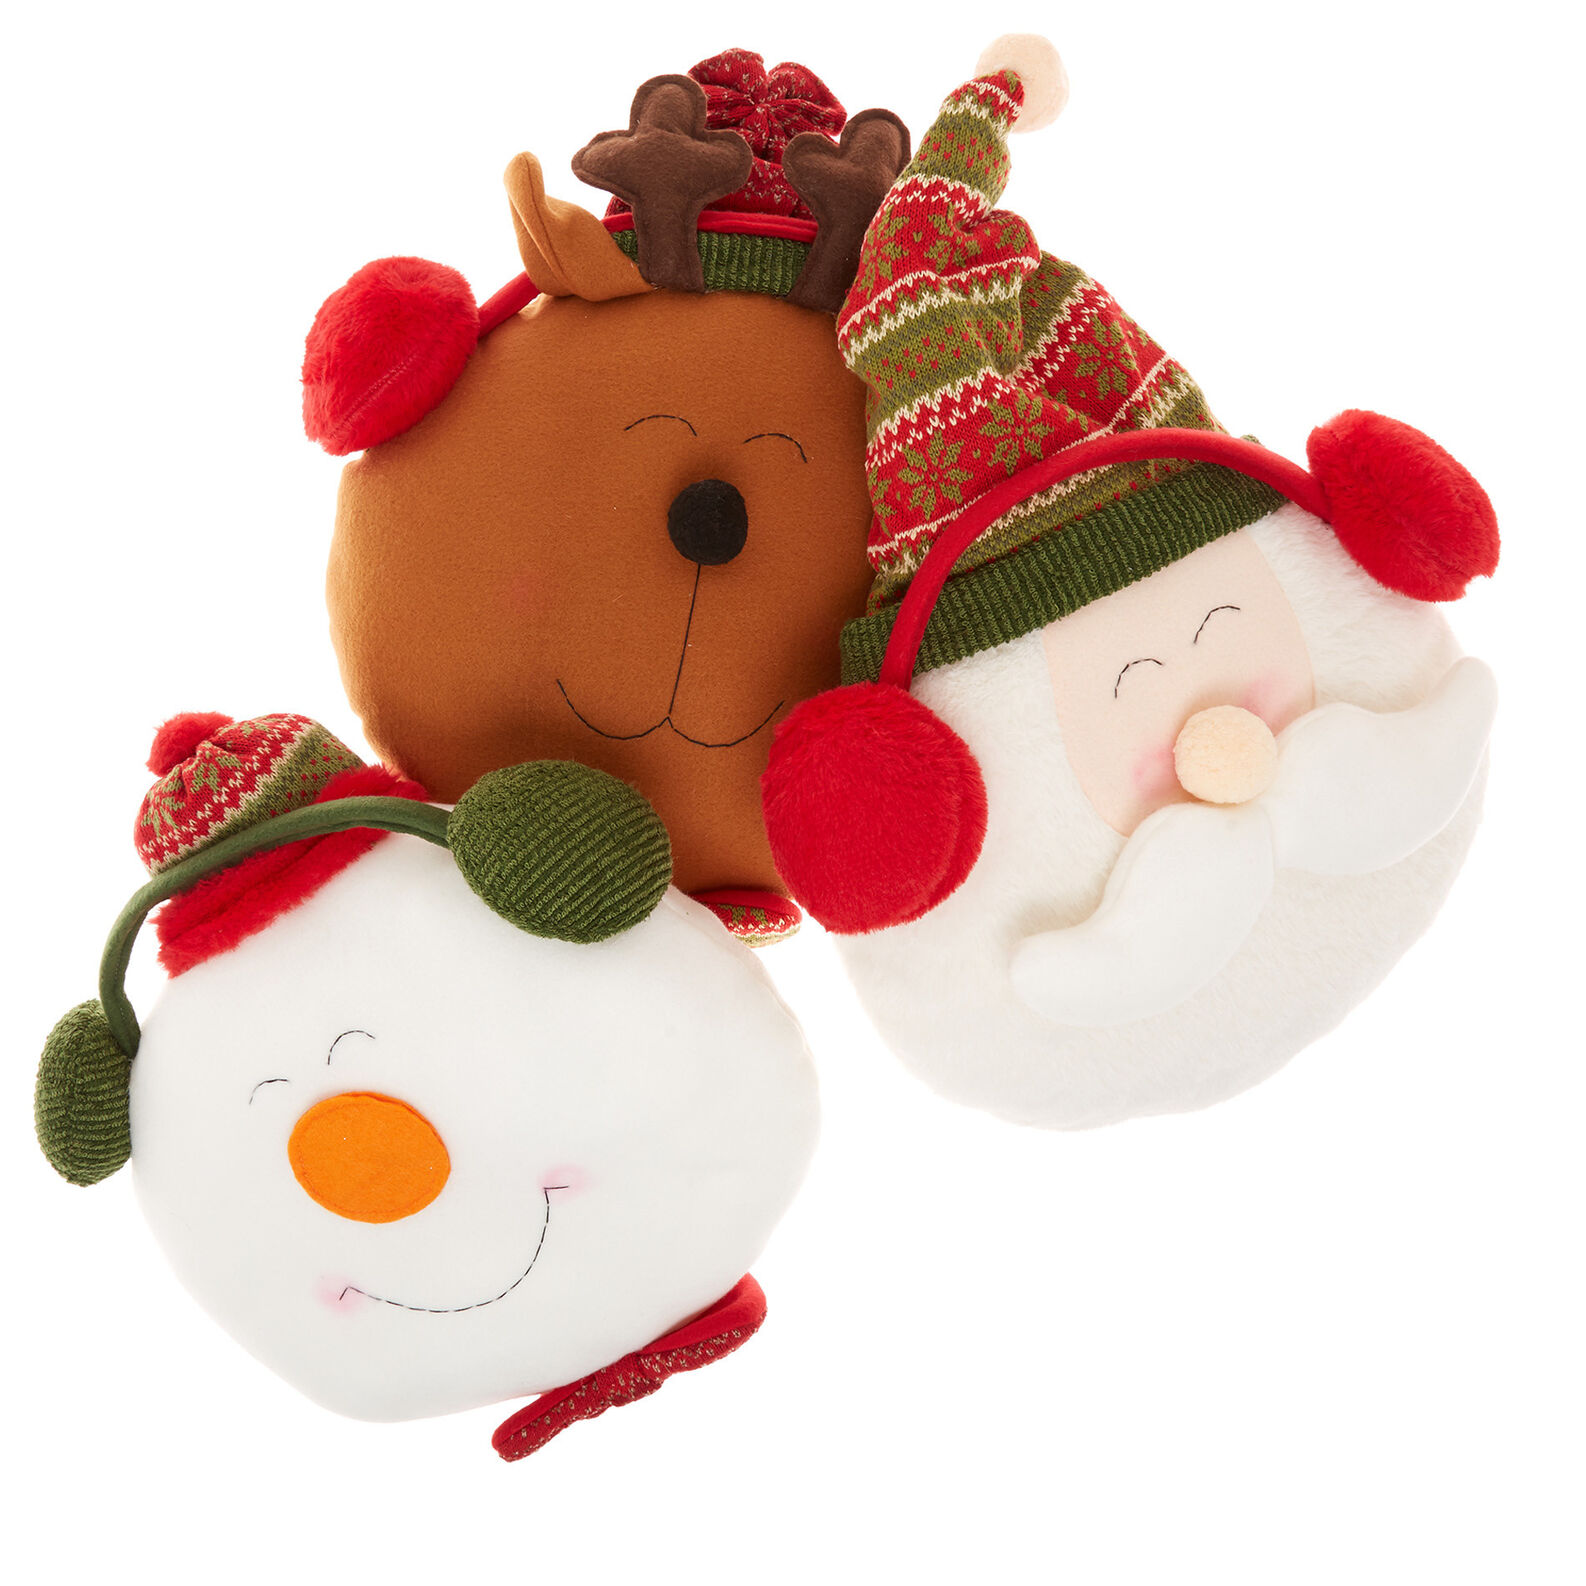 Decorative Christmas cushion